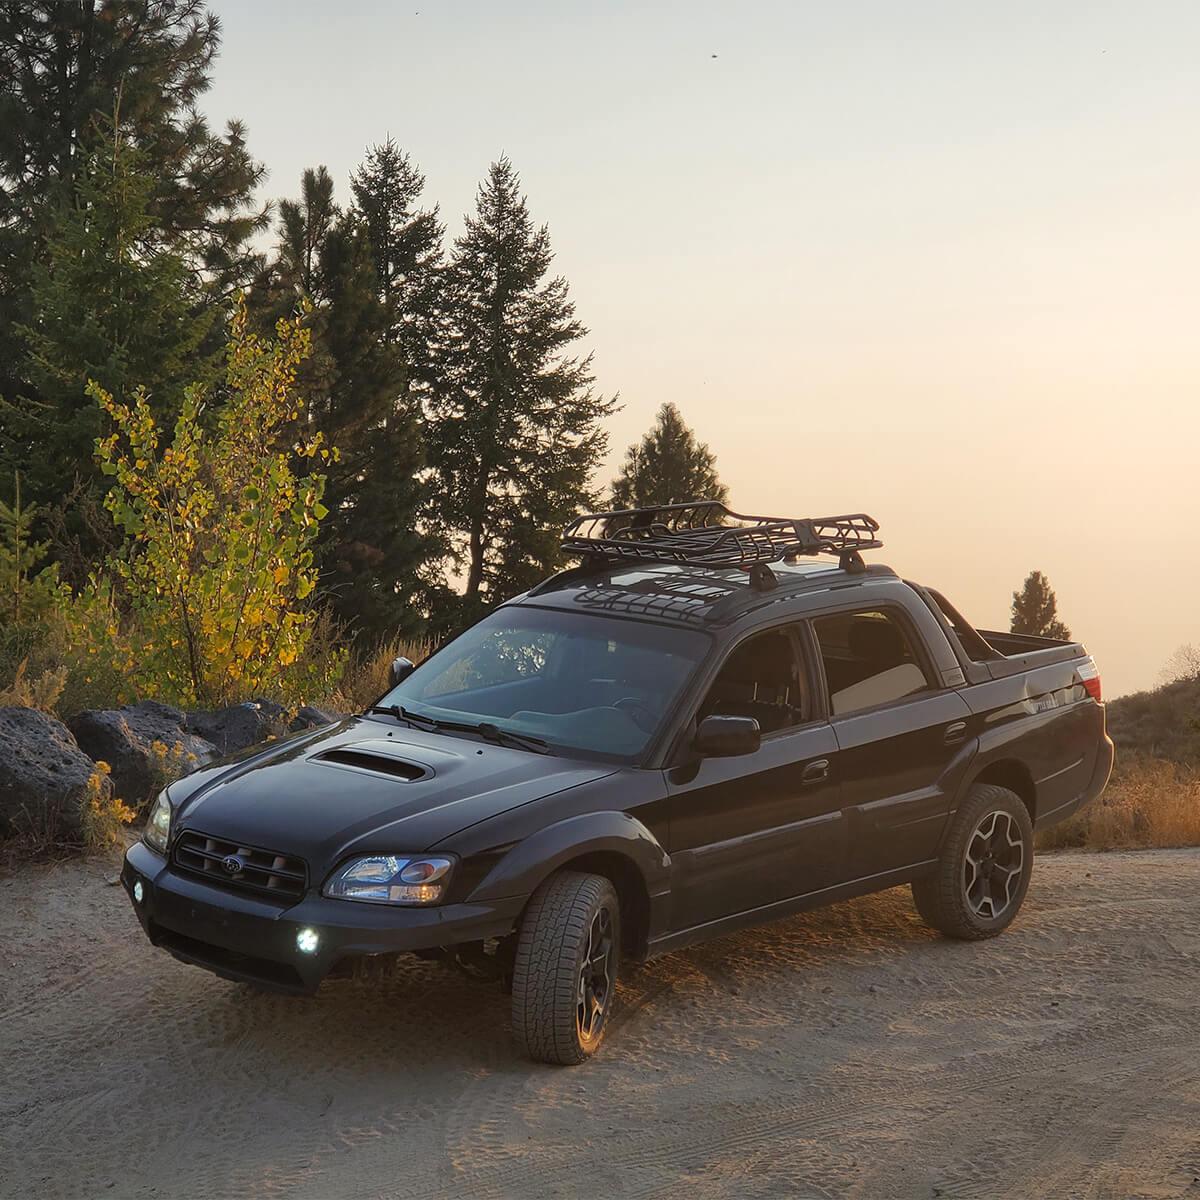 Subaru Baja off-road truck